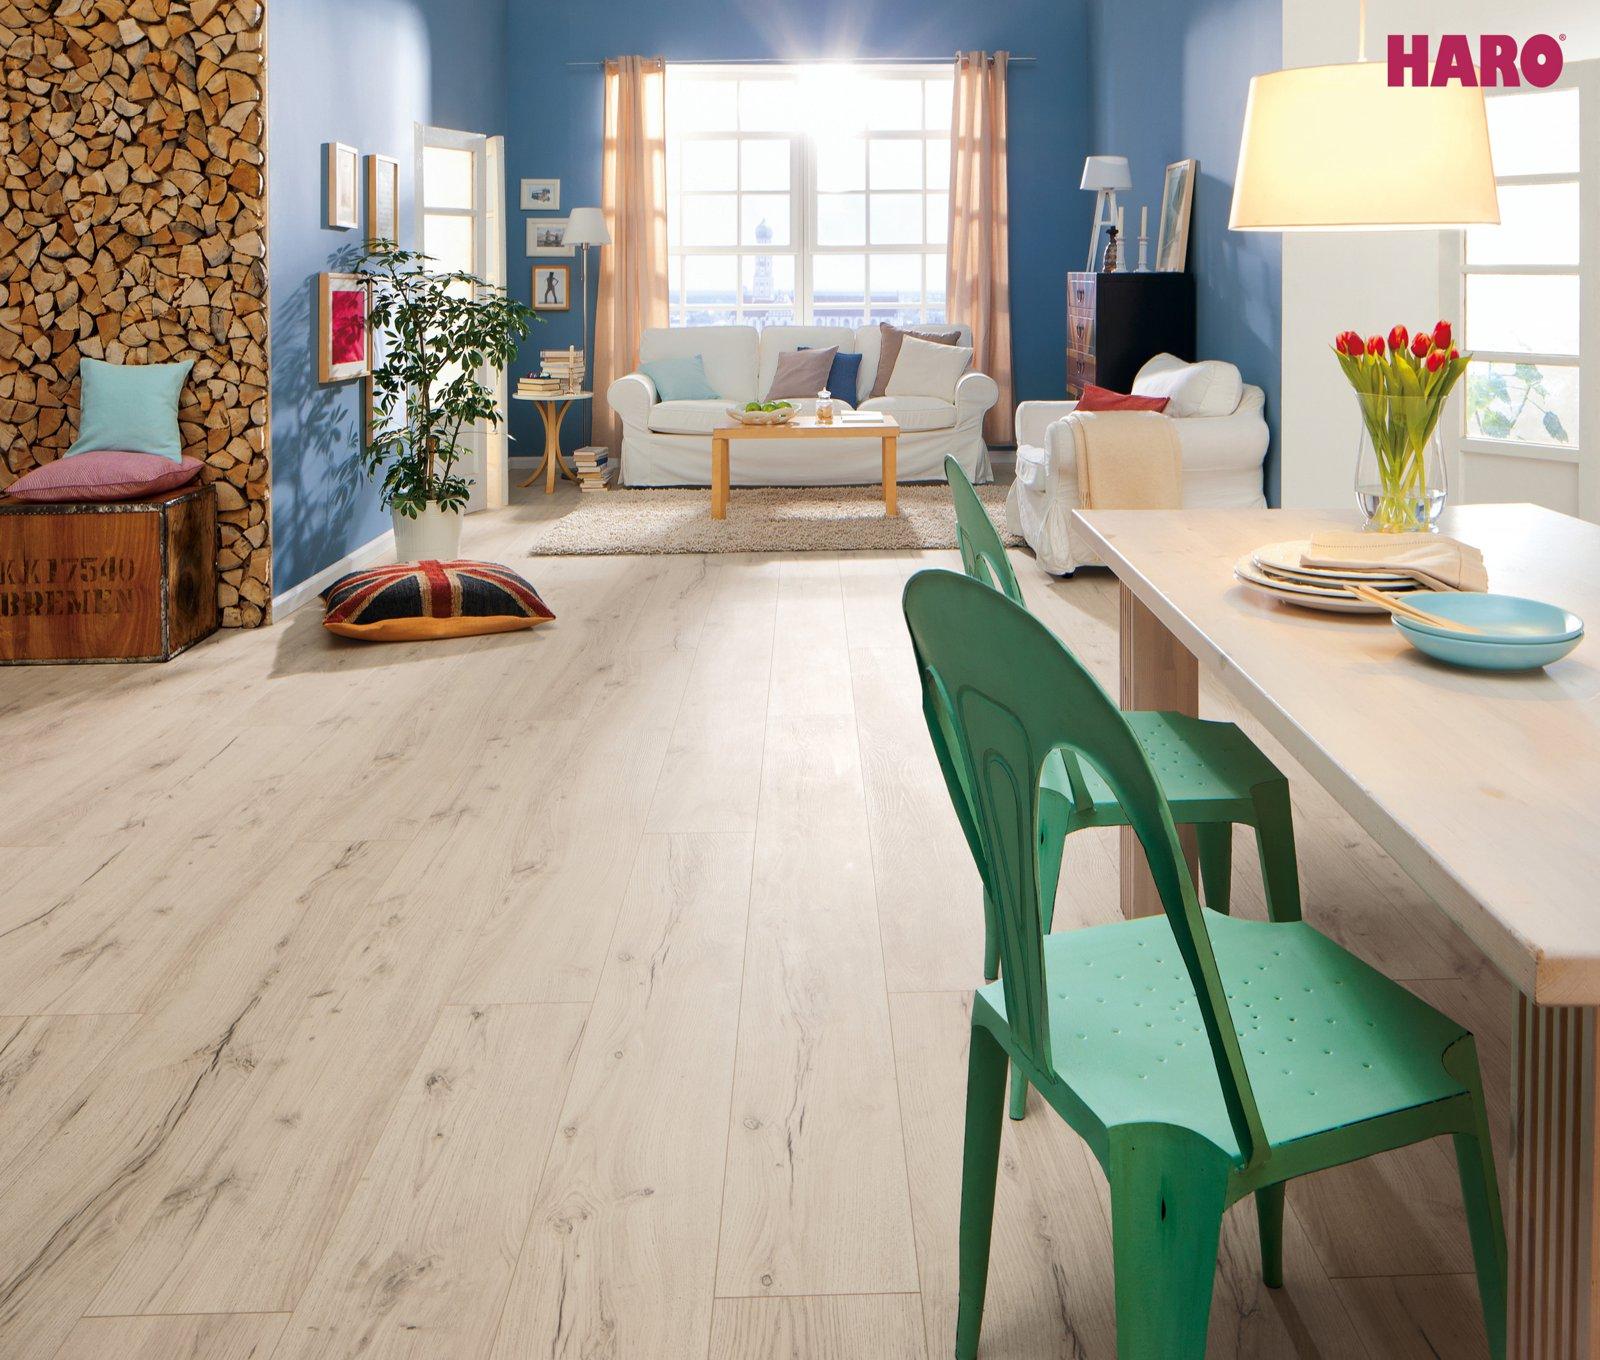 laminaatti tritty 100 gran via alppitammi valkoinen lankku authentic matta 4v 2 68 m pak. Black Bedroom Furniture Sets. Home Design Ideas